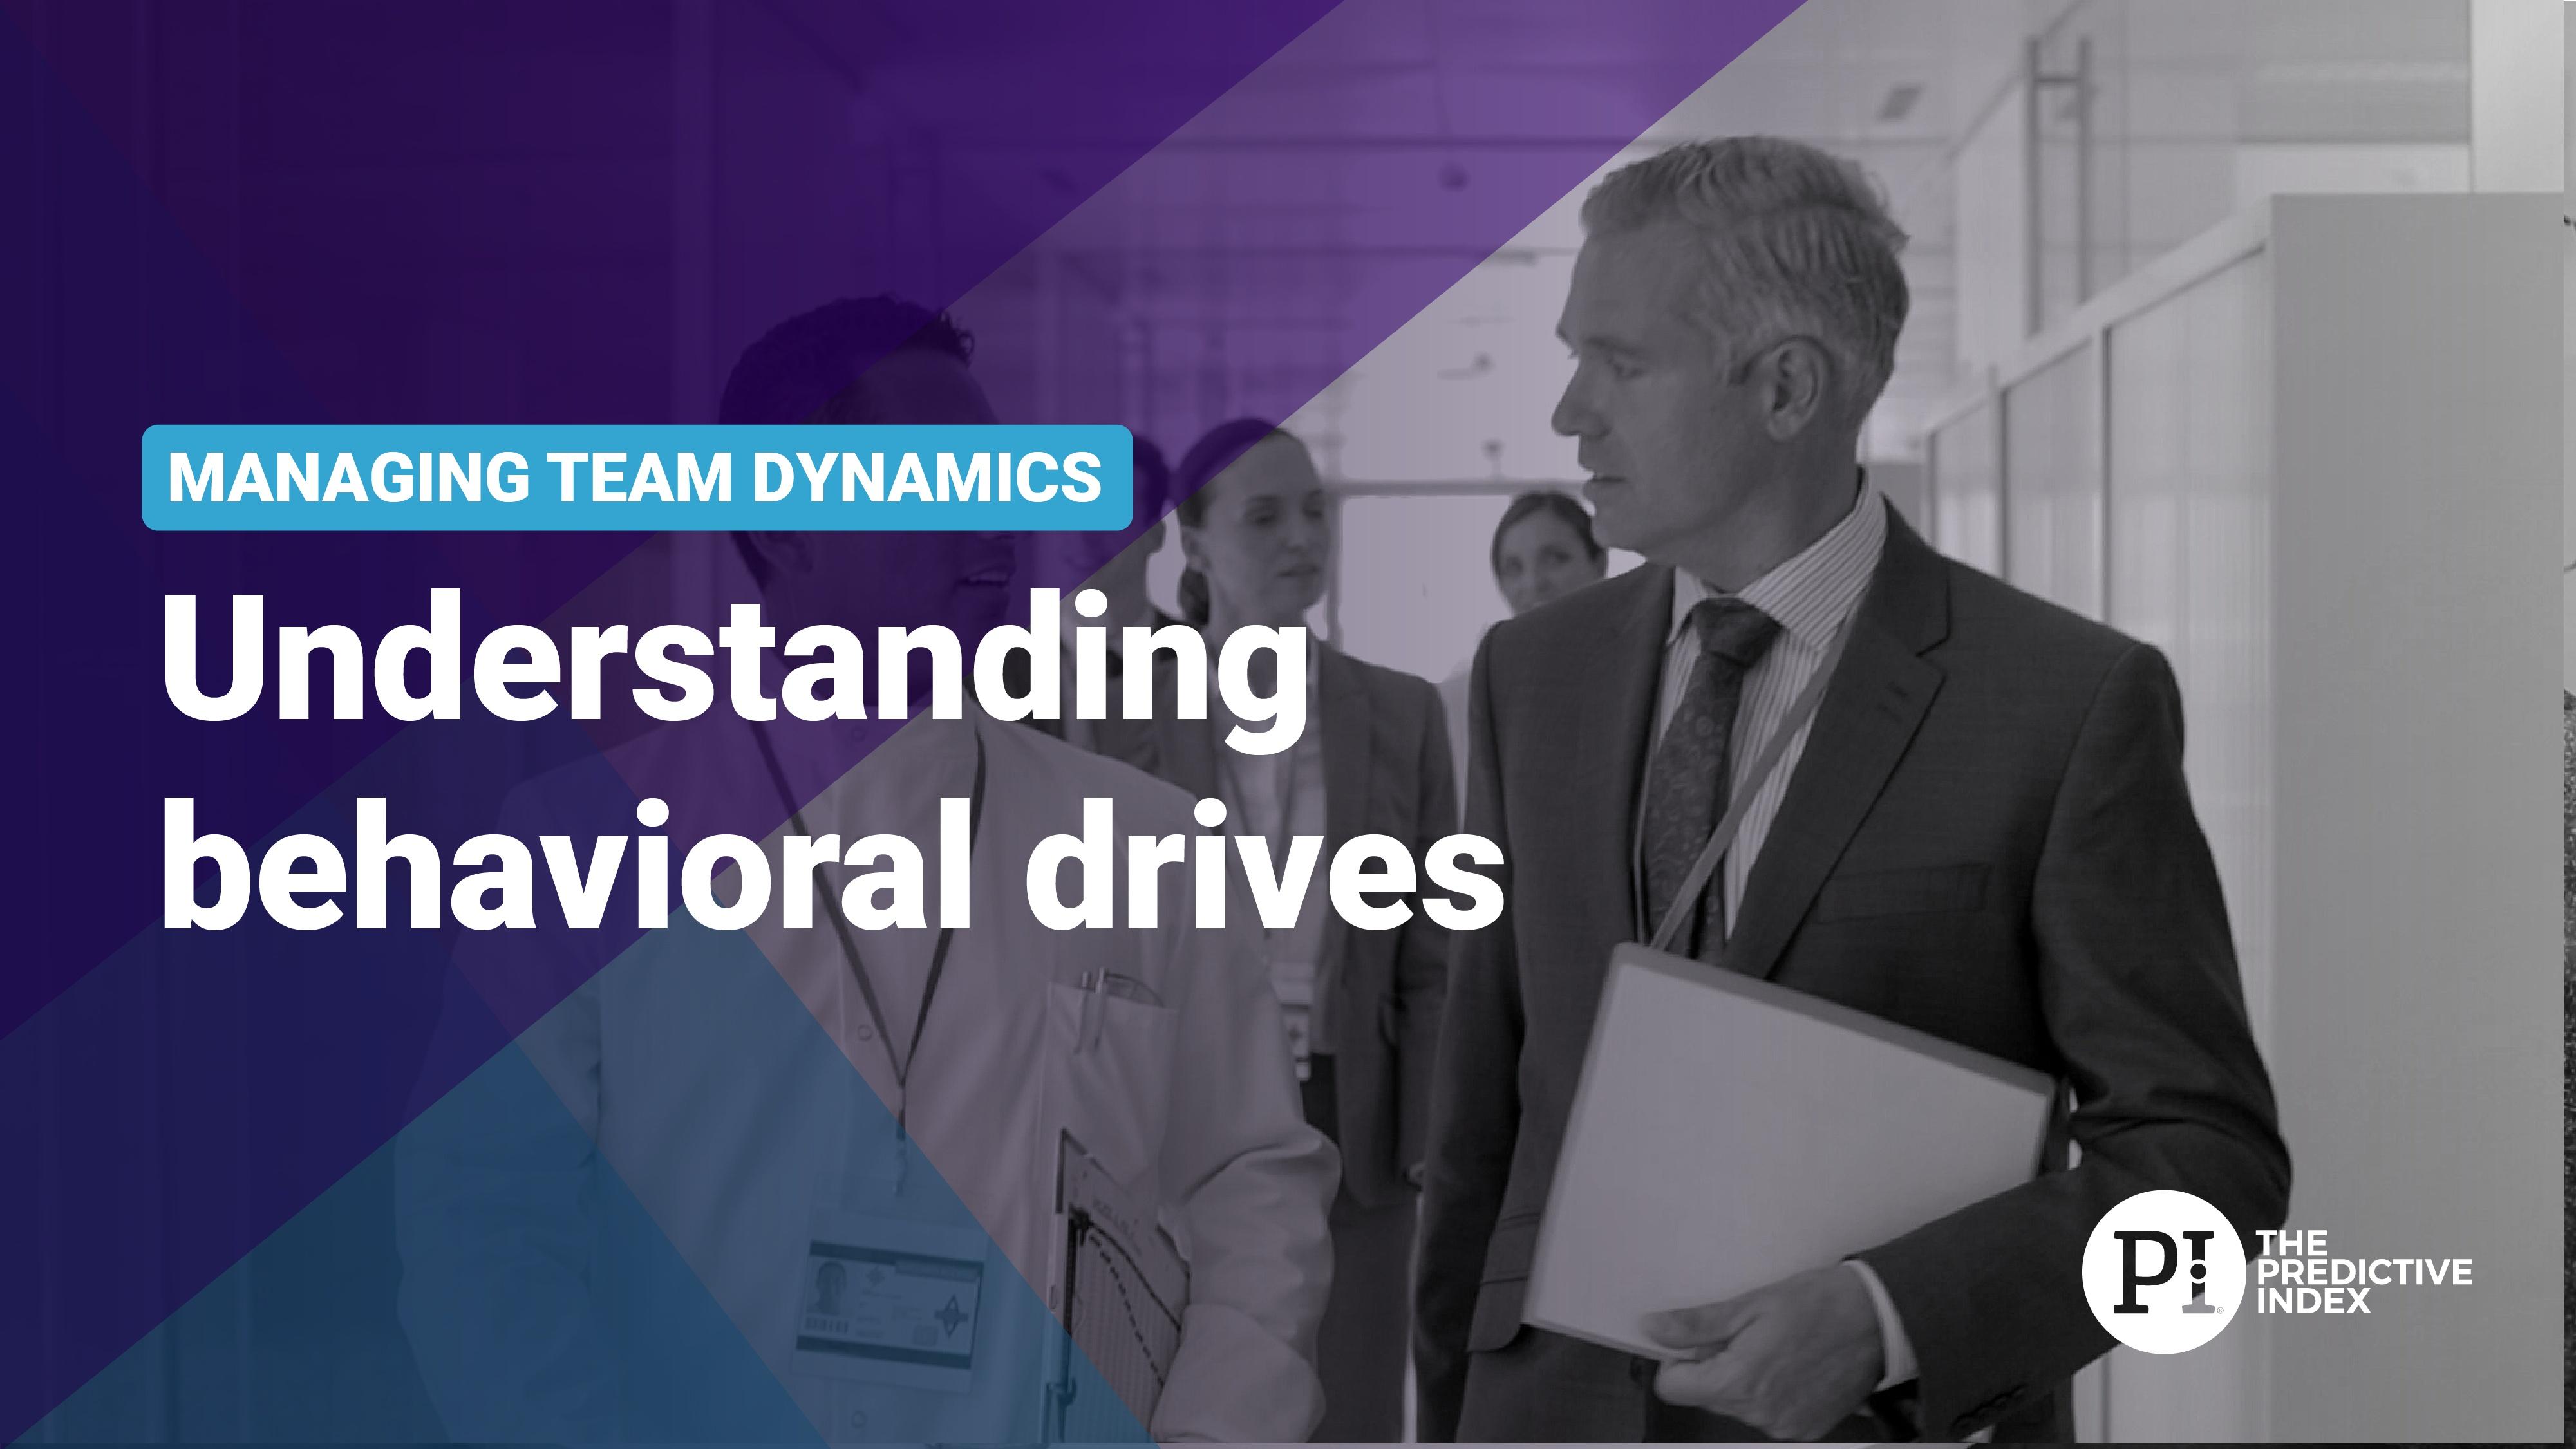 L1 - Understand behavioral drives